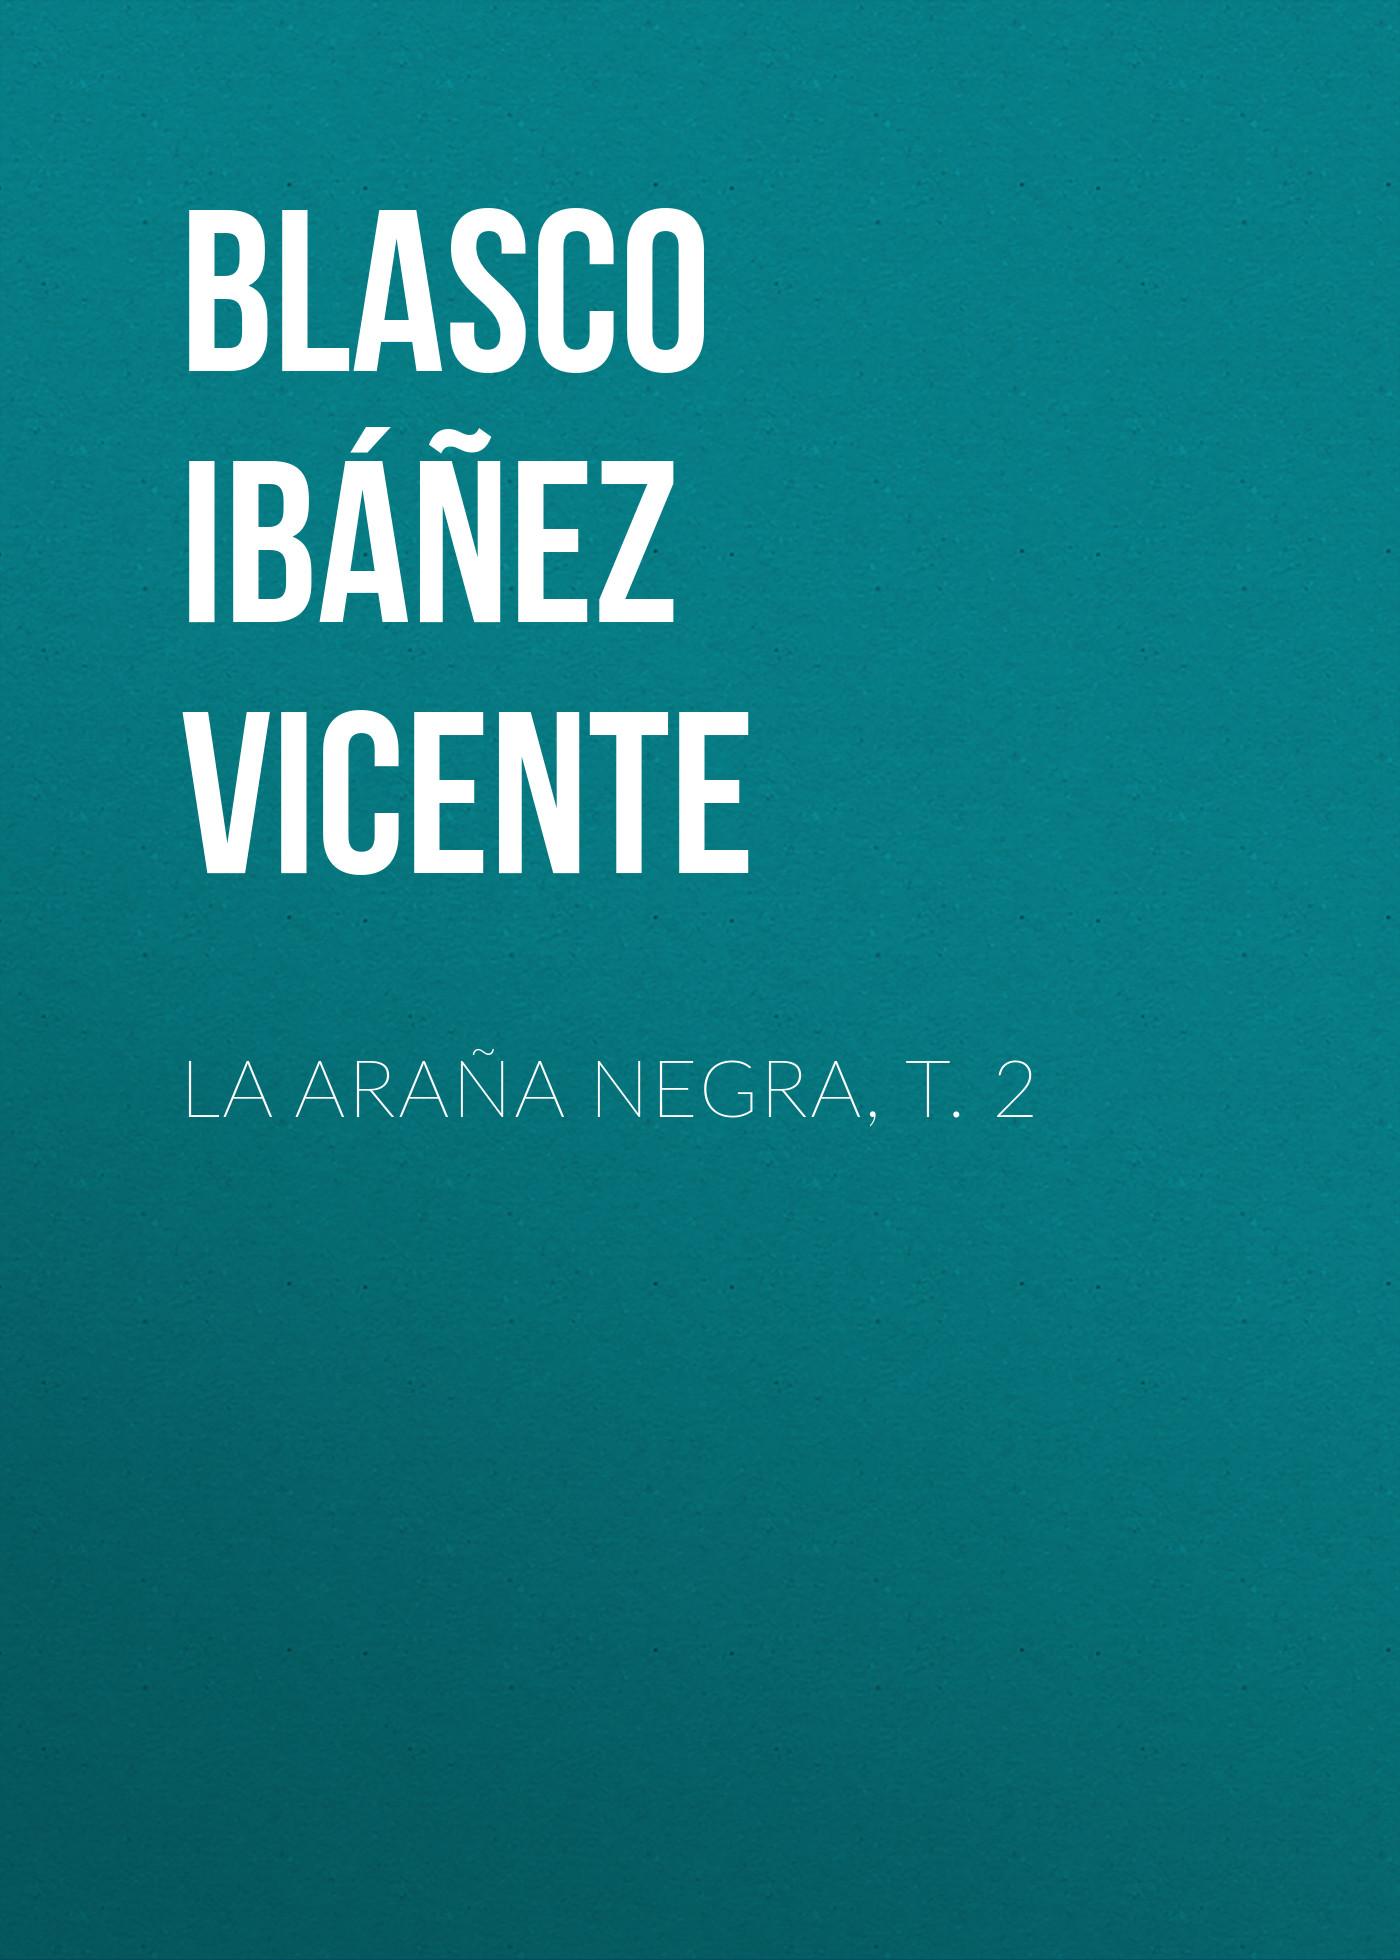 Blasco Ibáñez Vicente La araña negra, t. 2 blasco ibáñez vicente la araña negra t 1